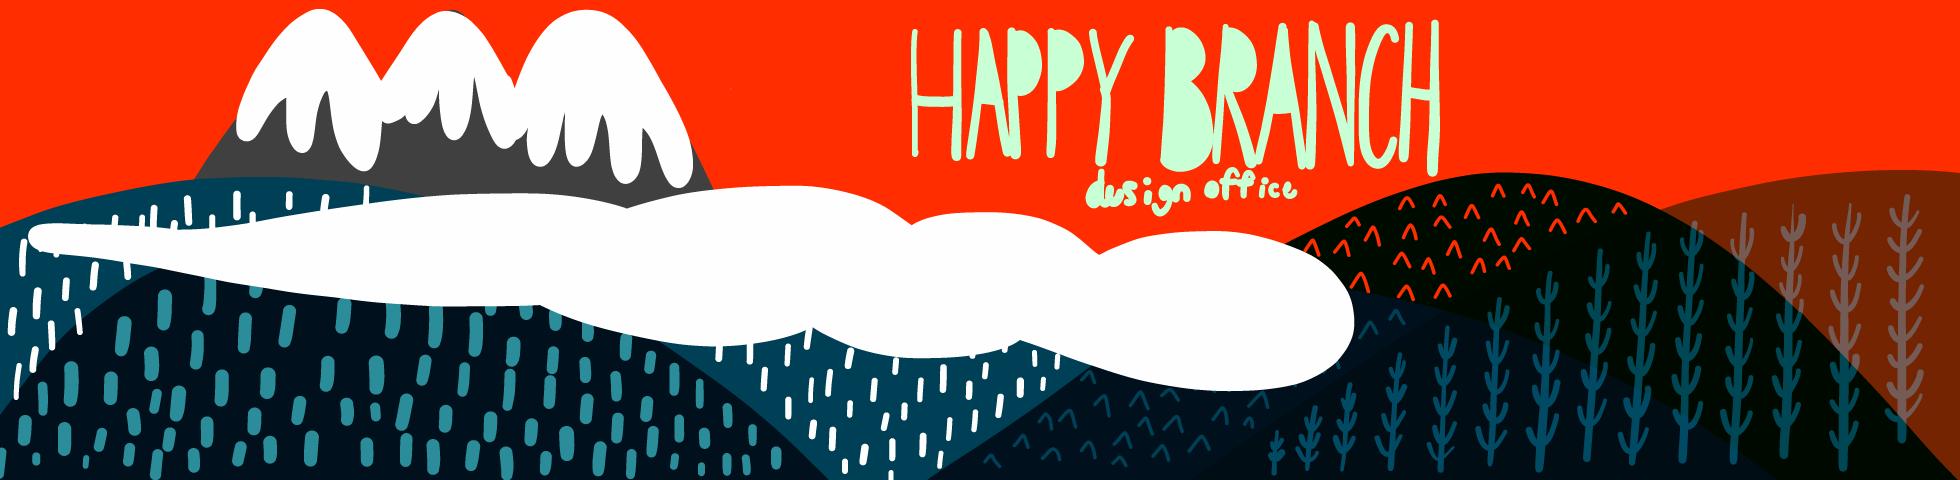 HappyBranch Design Office